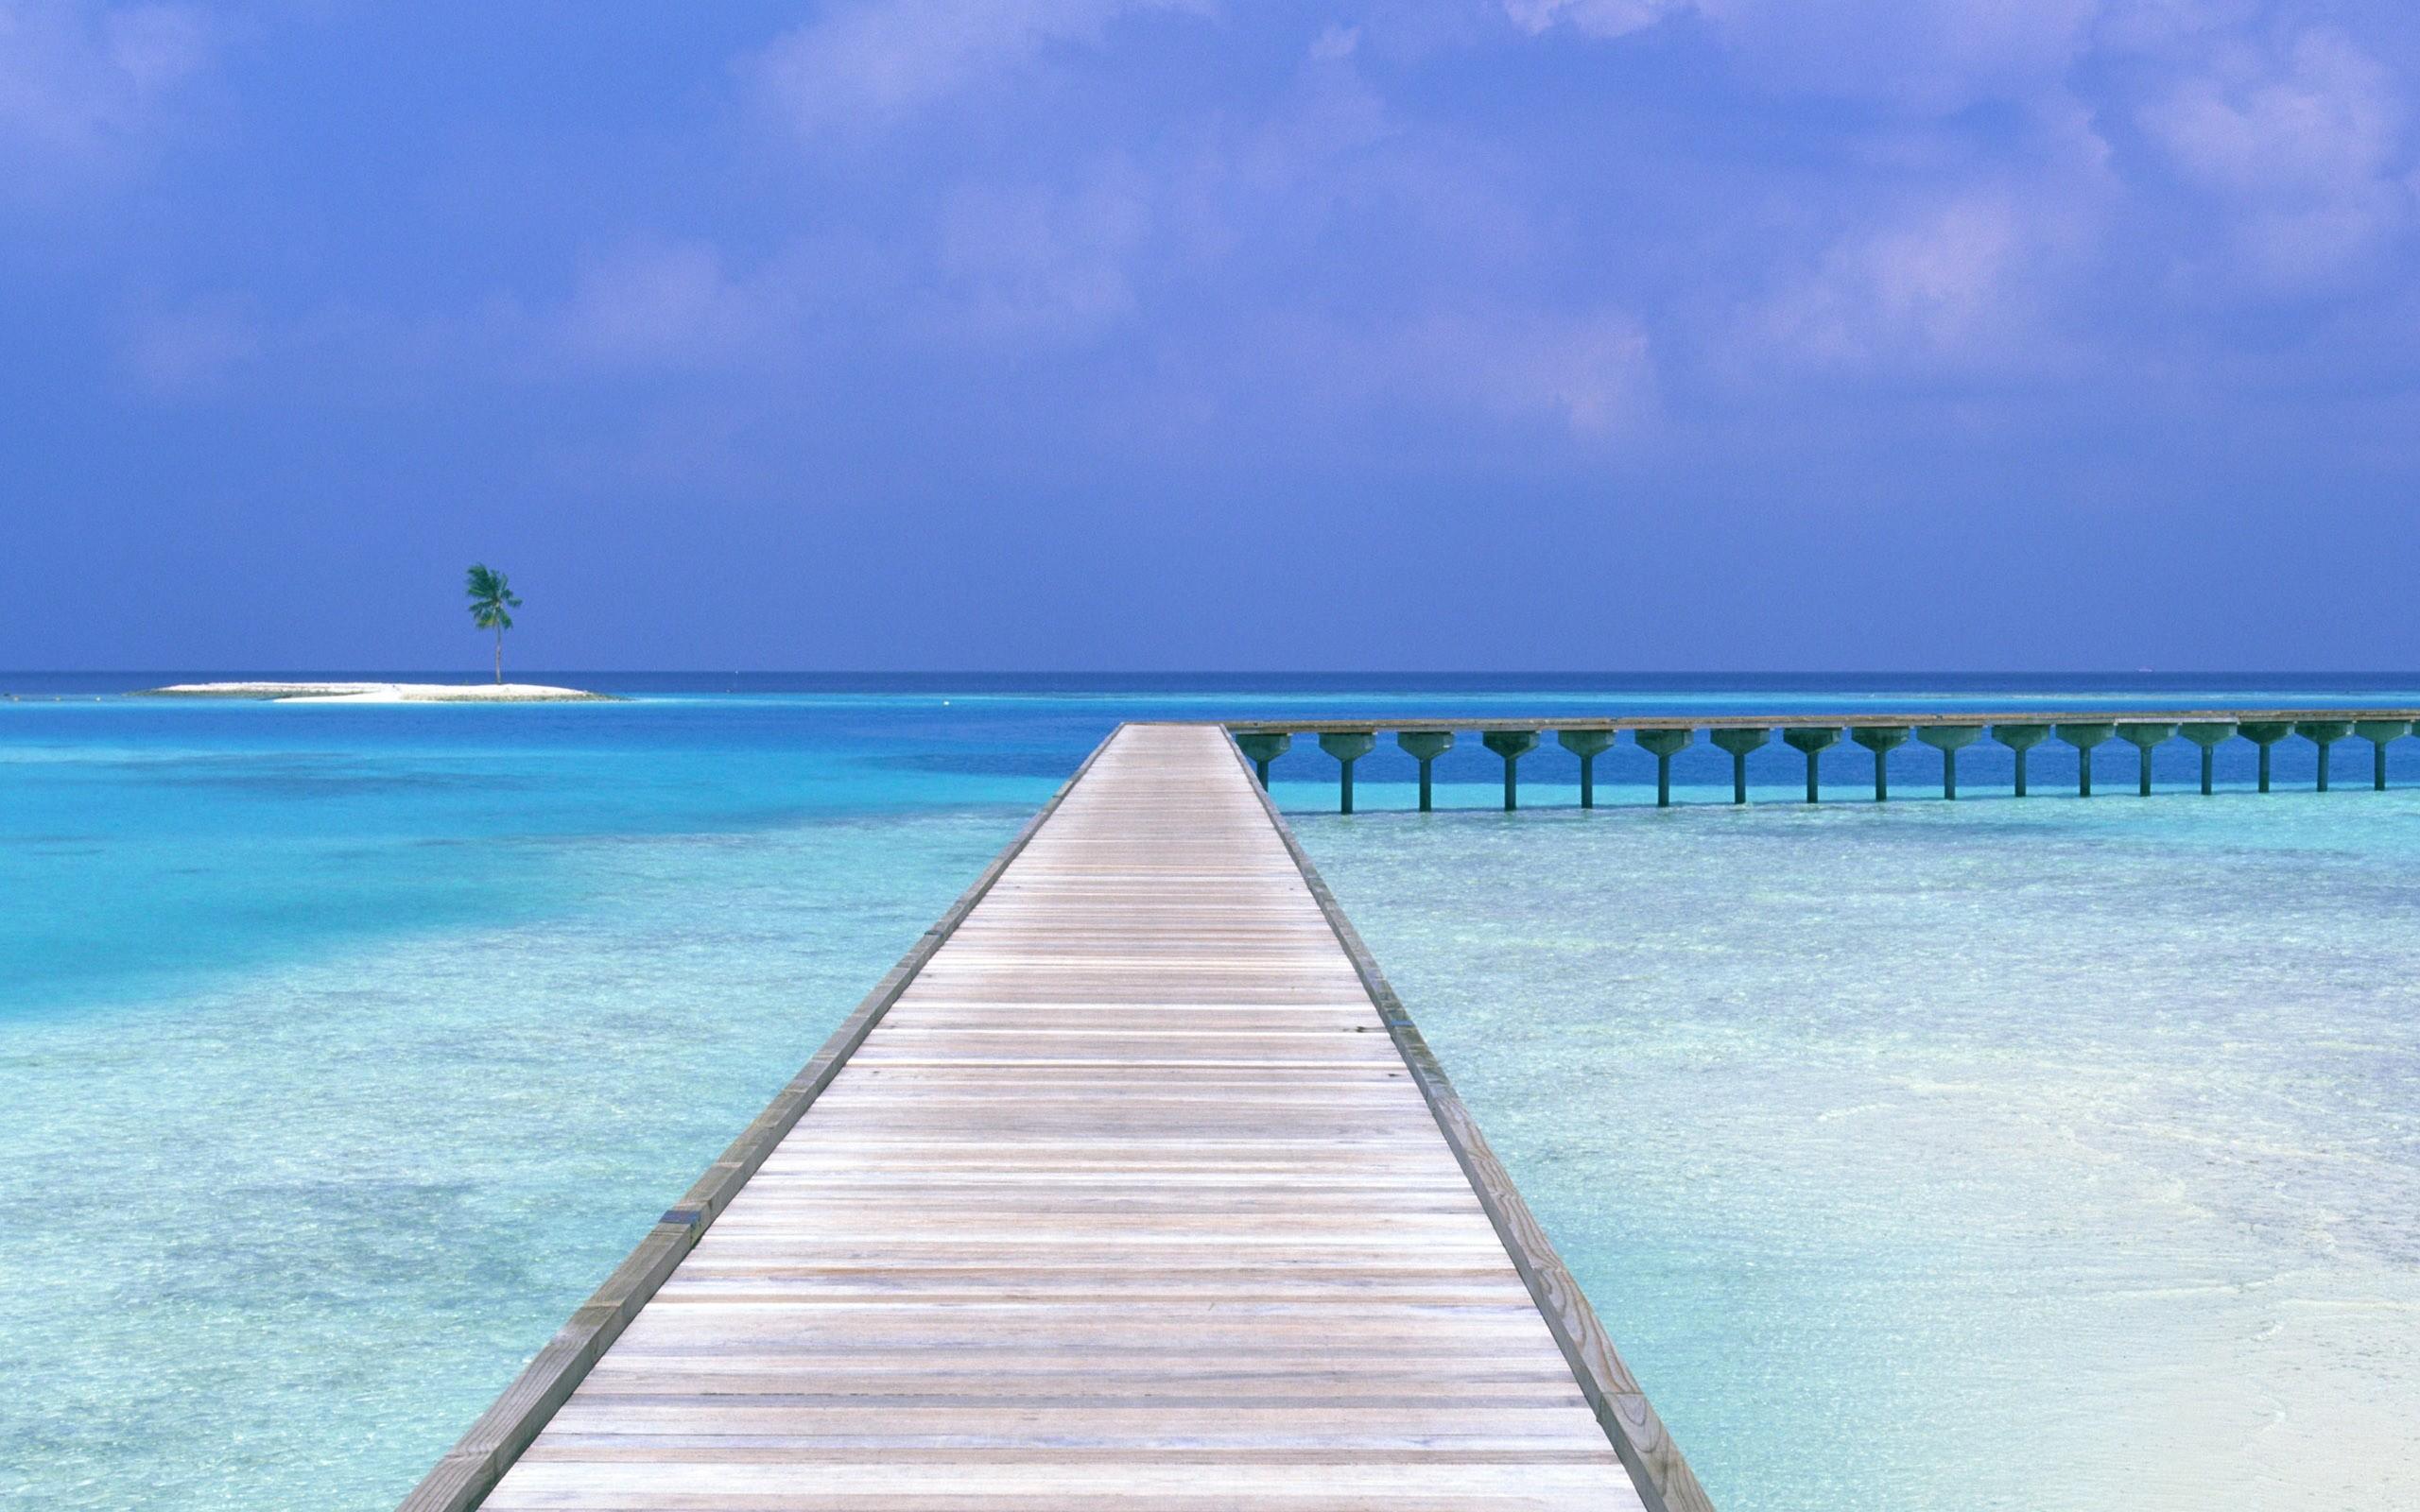 Beach Way Iphone Panoramic Wallpaper HD Pic